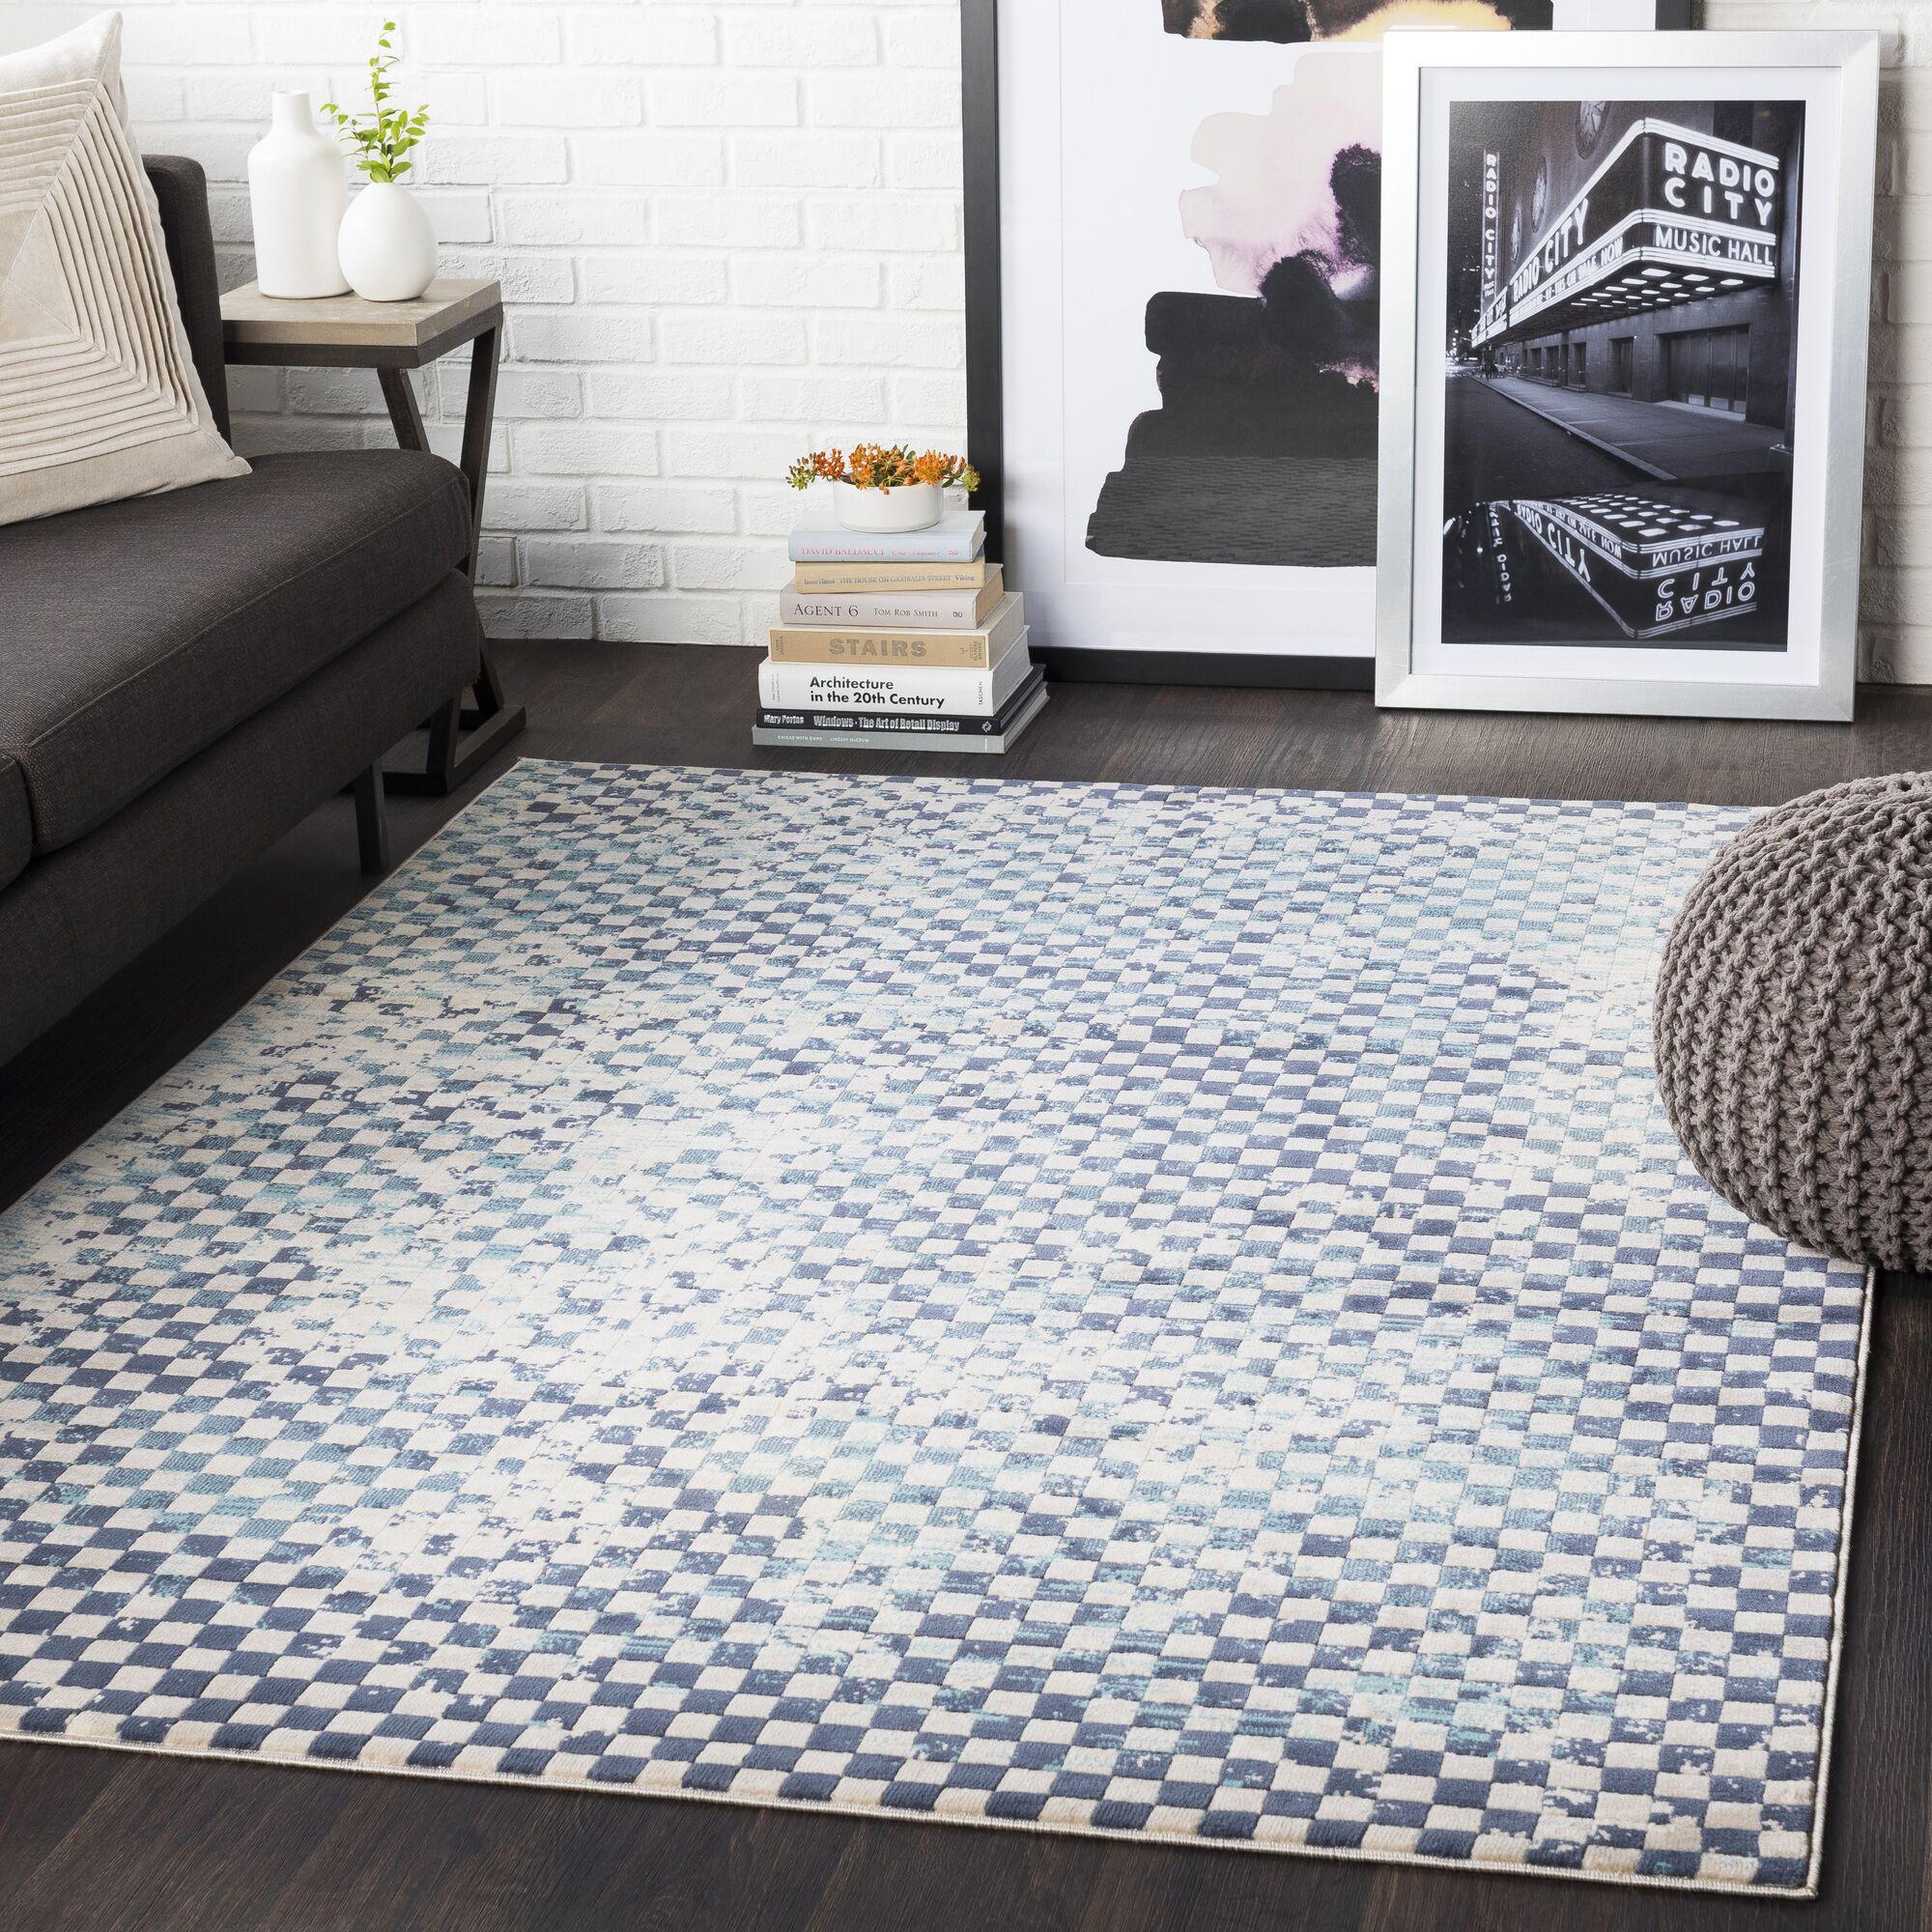 Ferreira Distressed Geometric Aqua/Charcoal Area Rug Rug Size: Rectangle 5'3